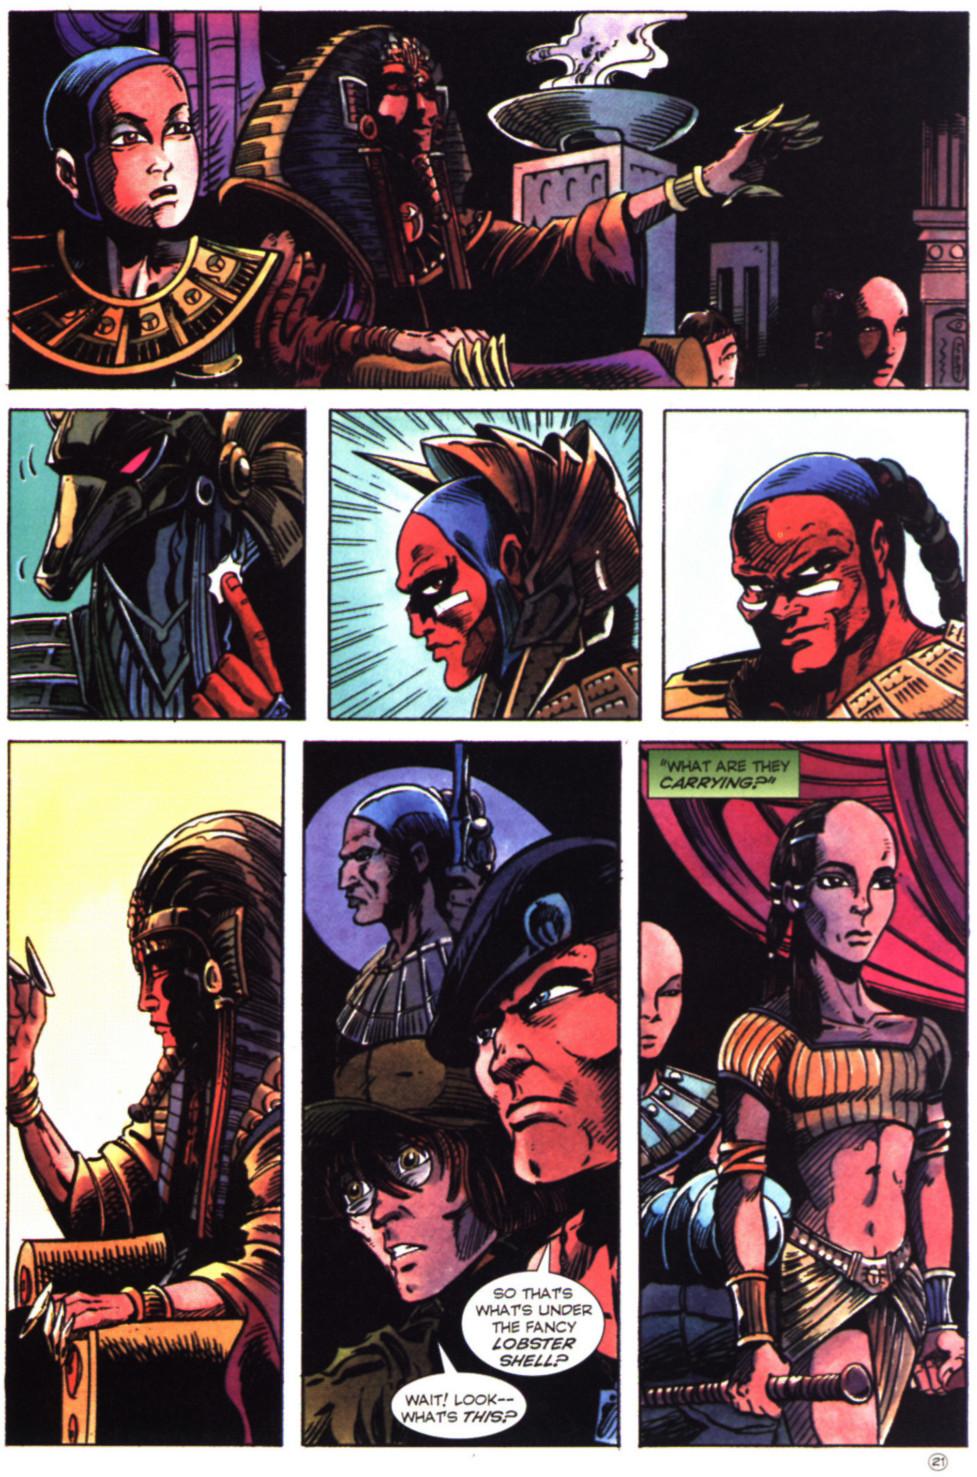 Read online Stargate comic -  Issue #2 - 23